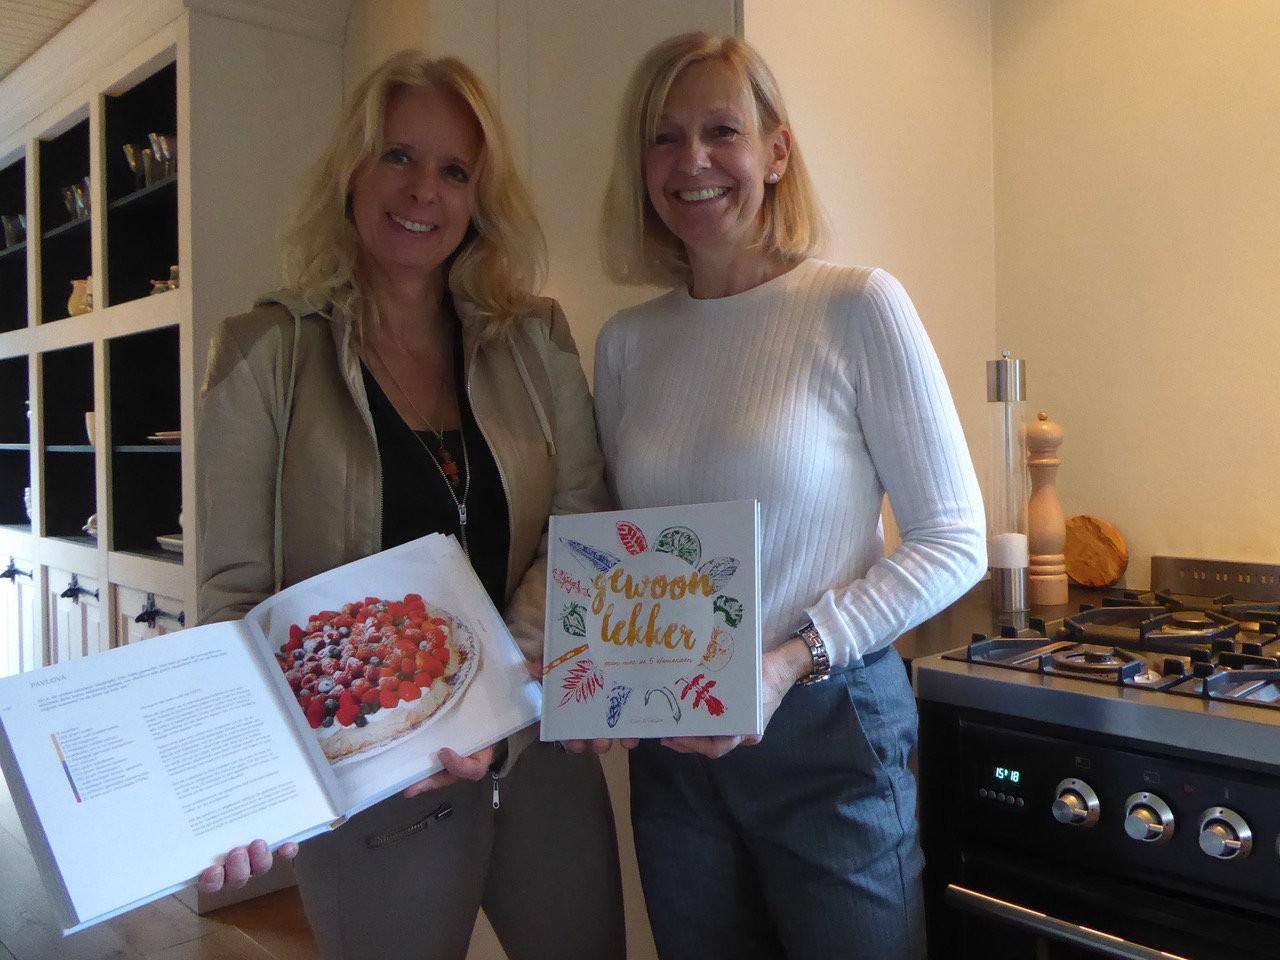 Super trots op 'Gewoon lekker' kookboek - Ellen Richardson  en Sietske Nogueras